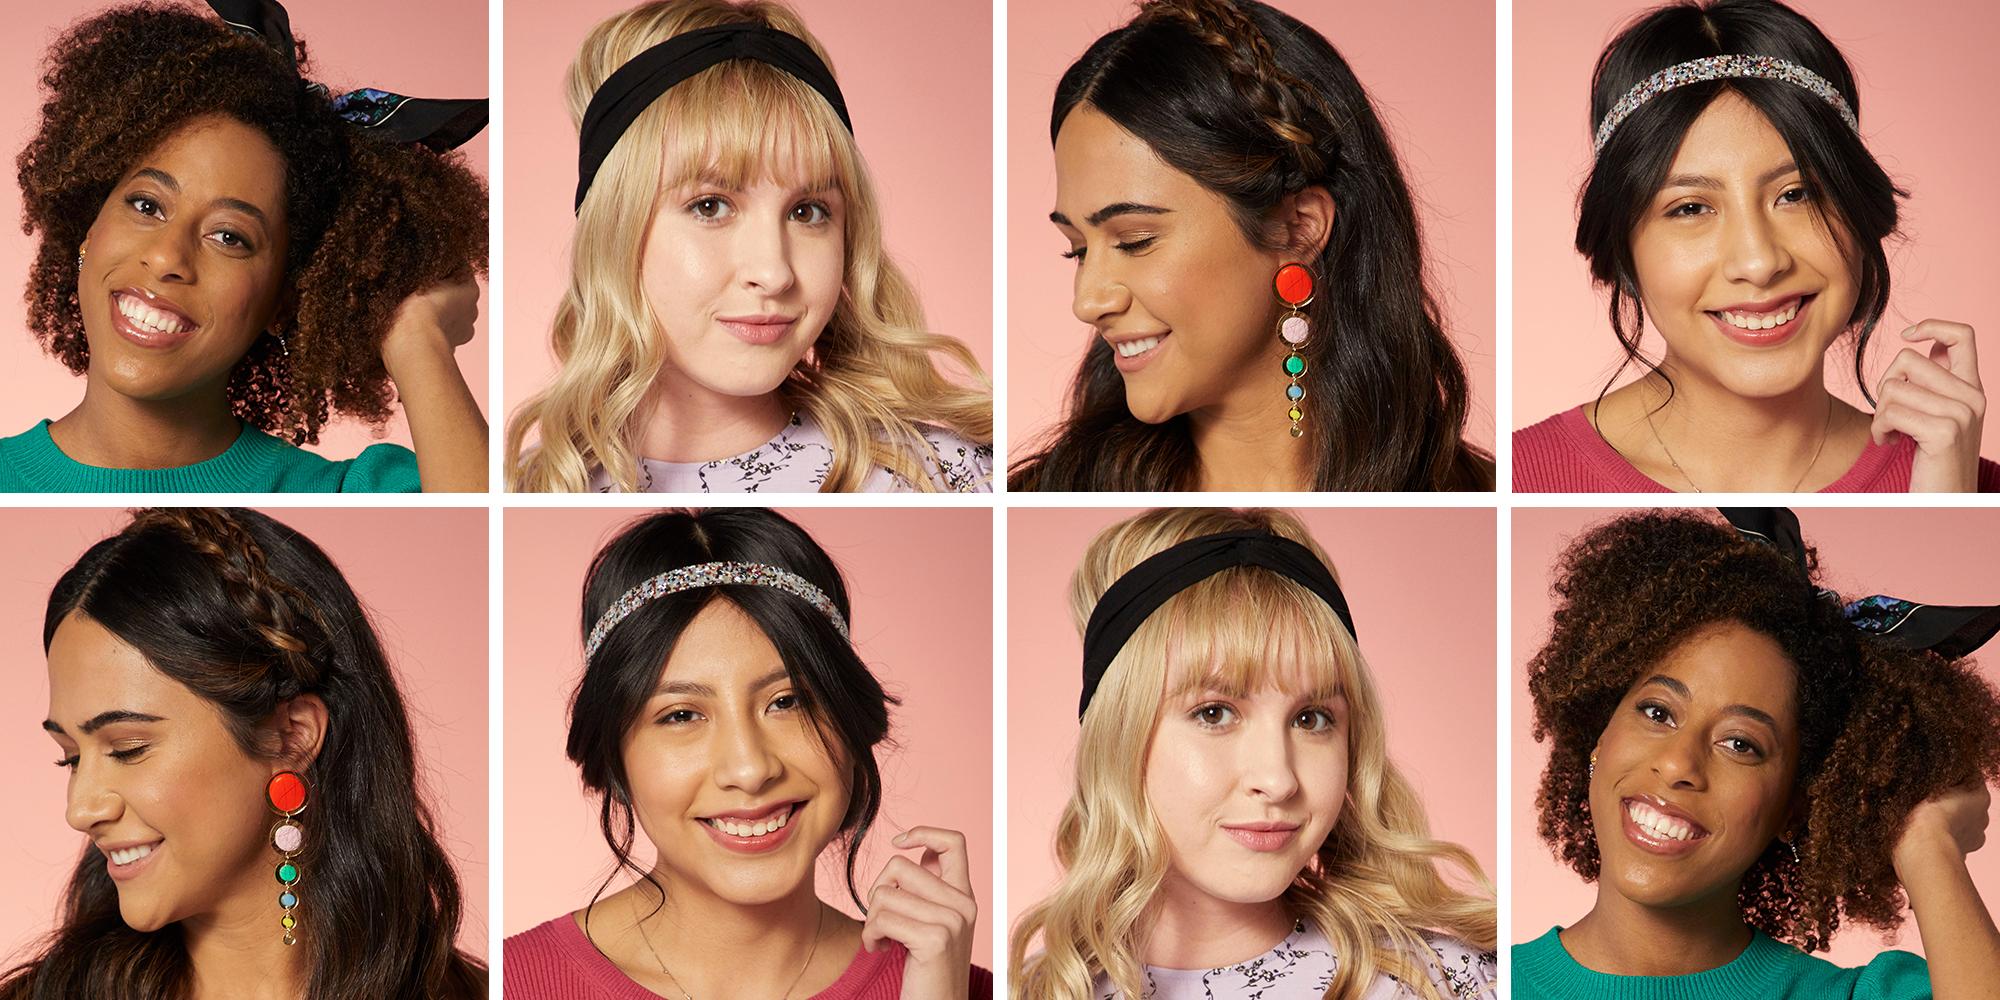 How to Wear a Headband - Cute Headband Styles for Adults